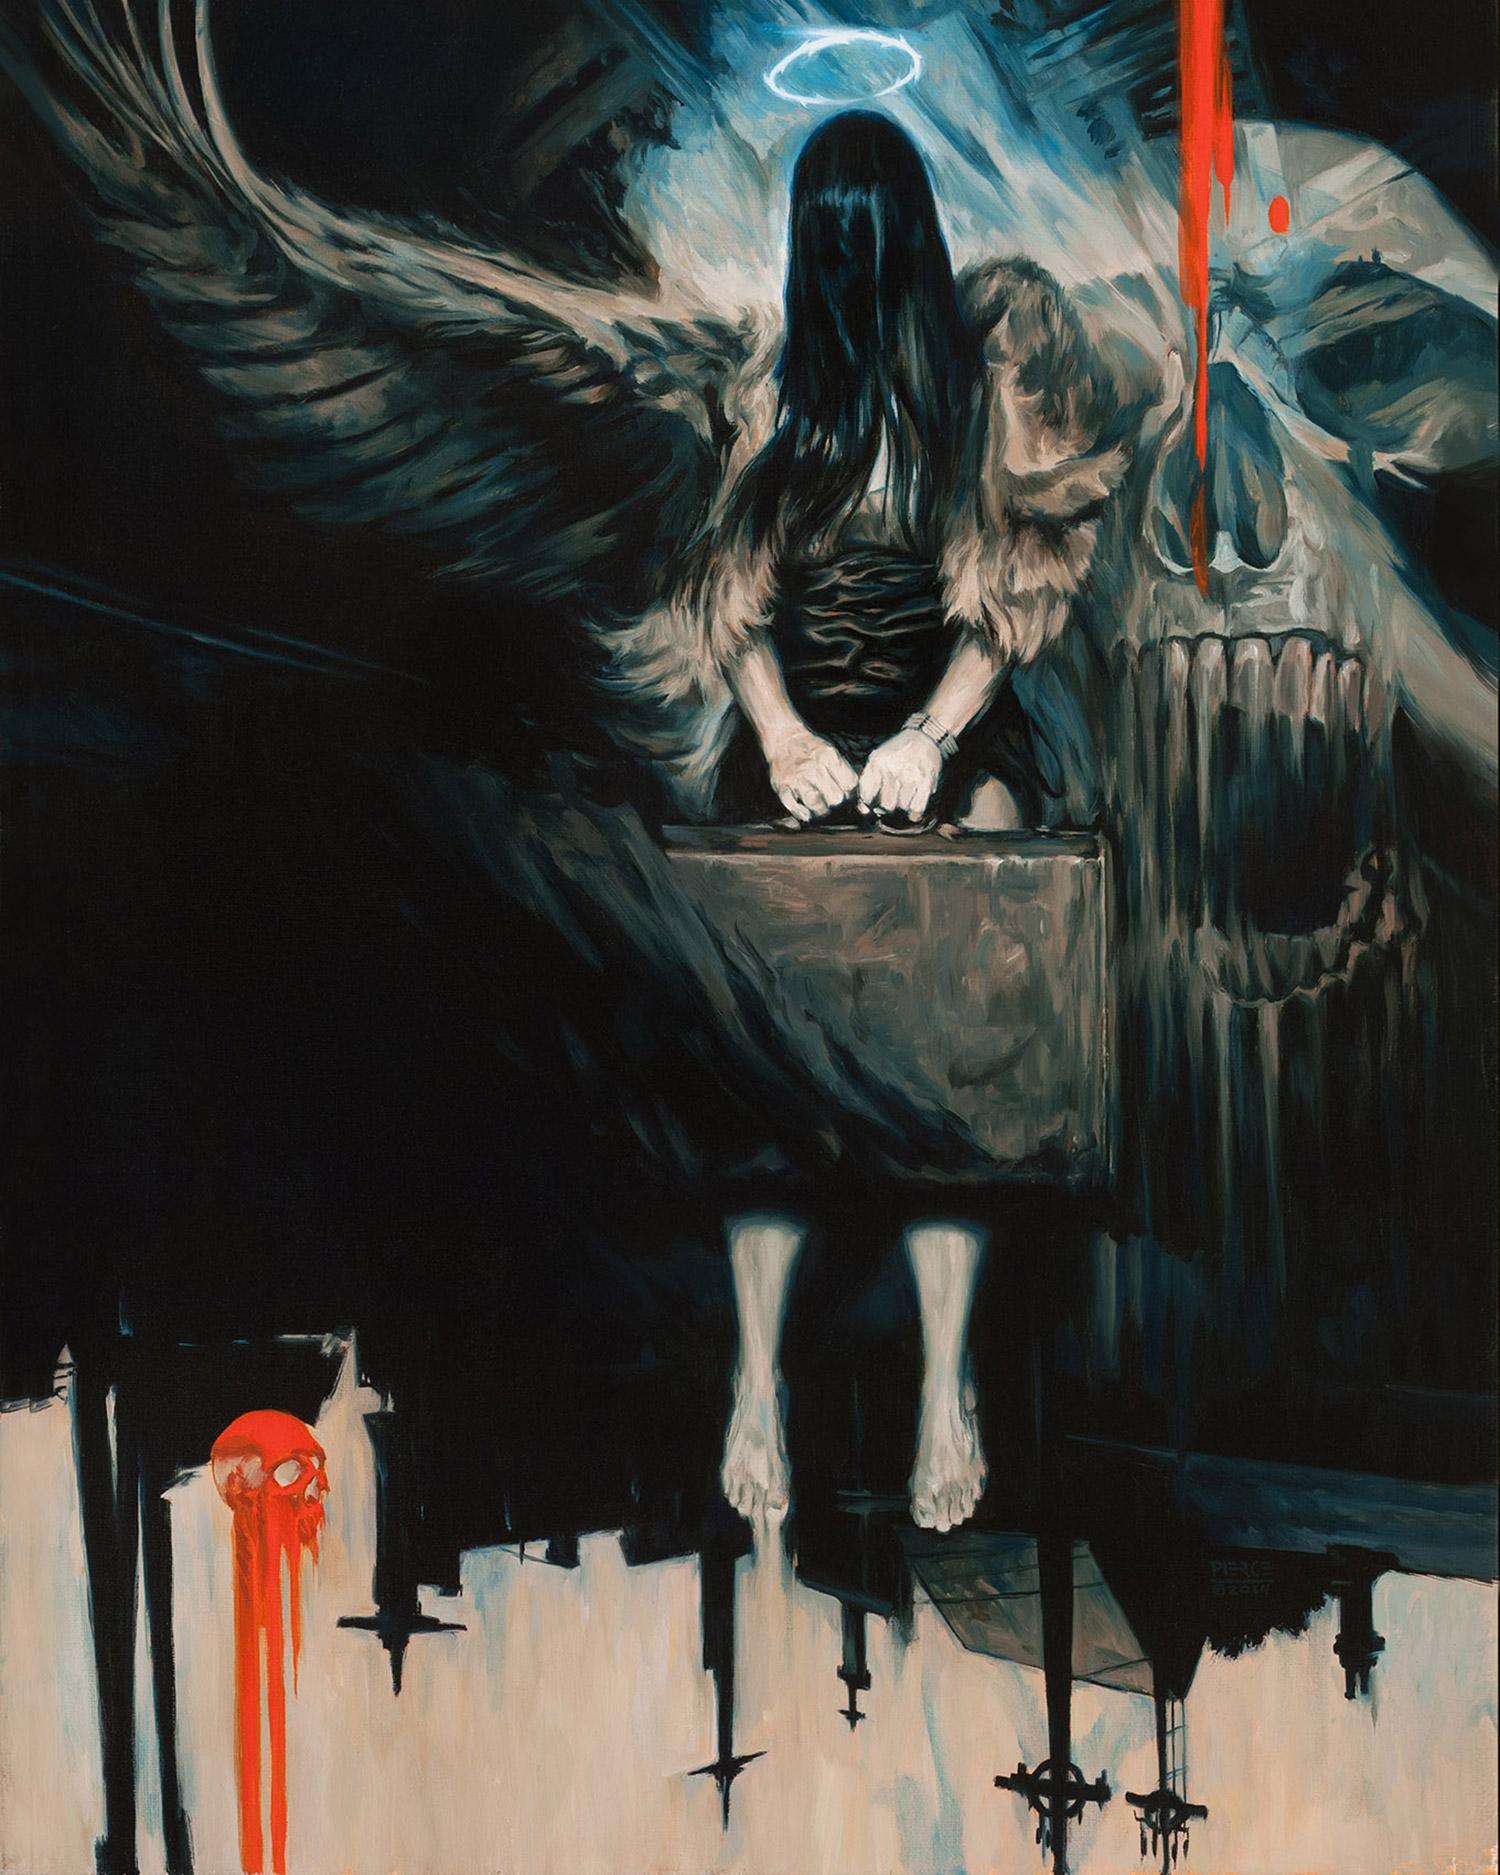 Shane Pierce - Her Last Rites